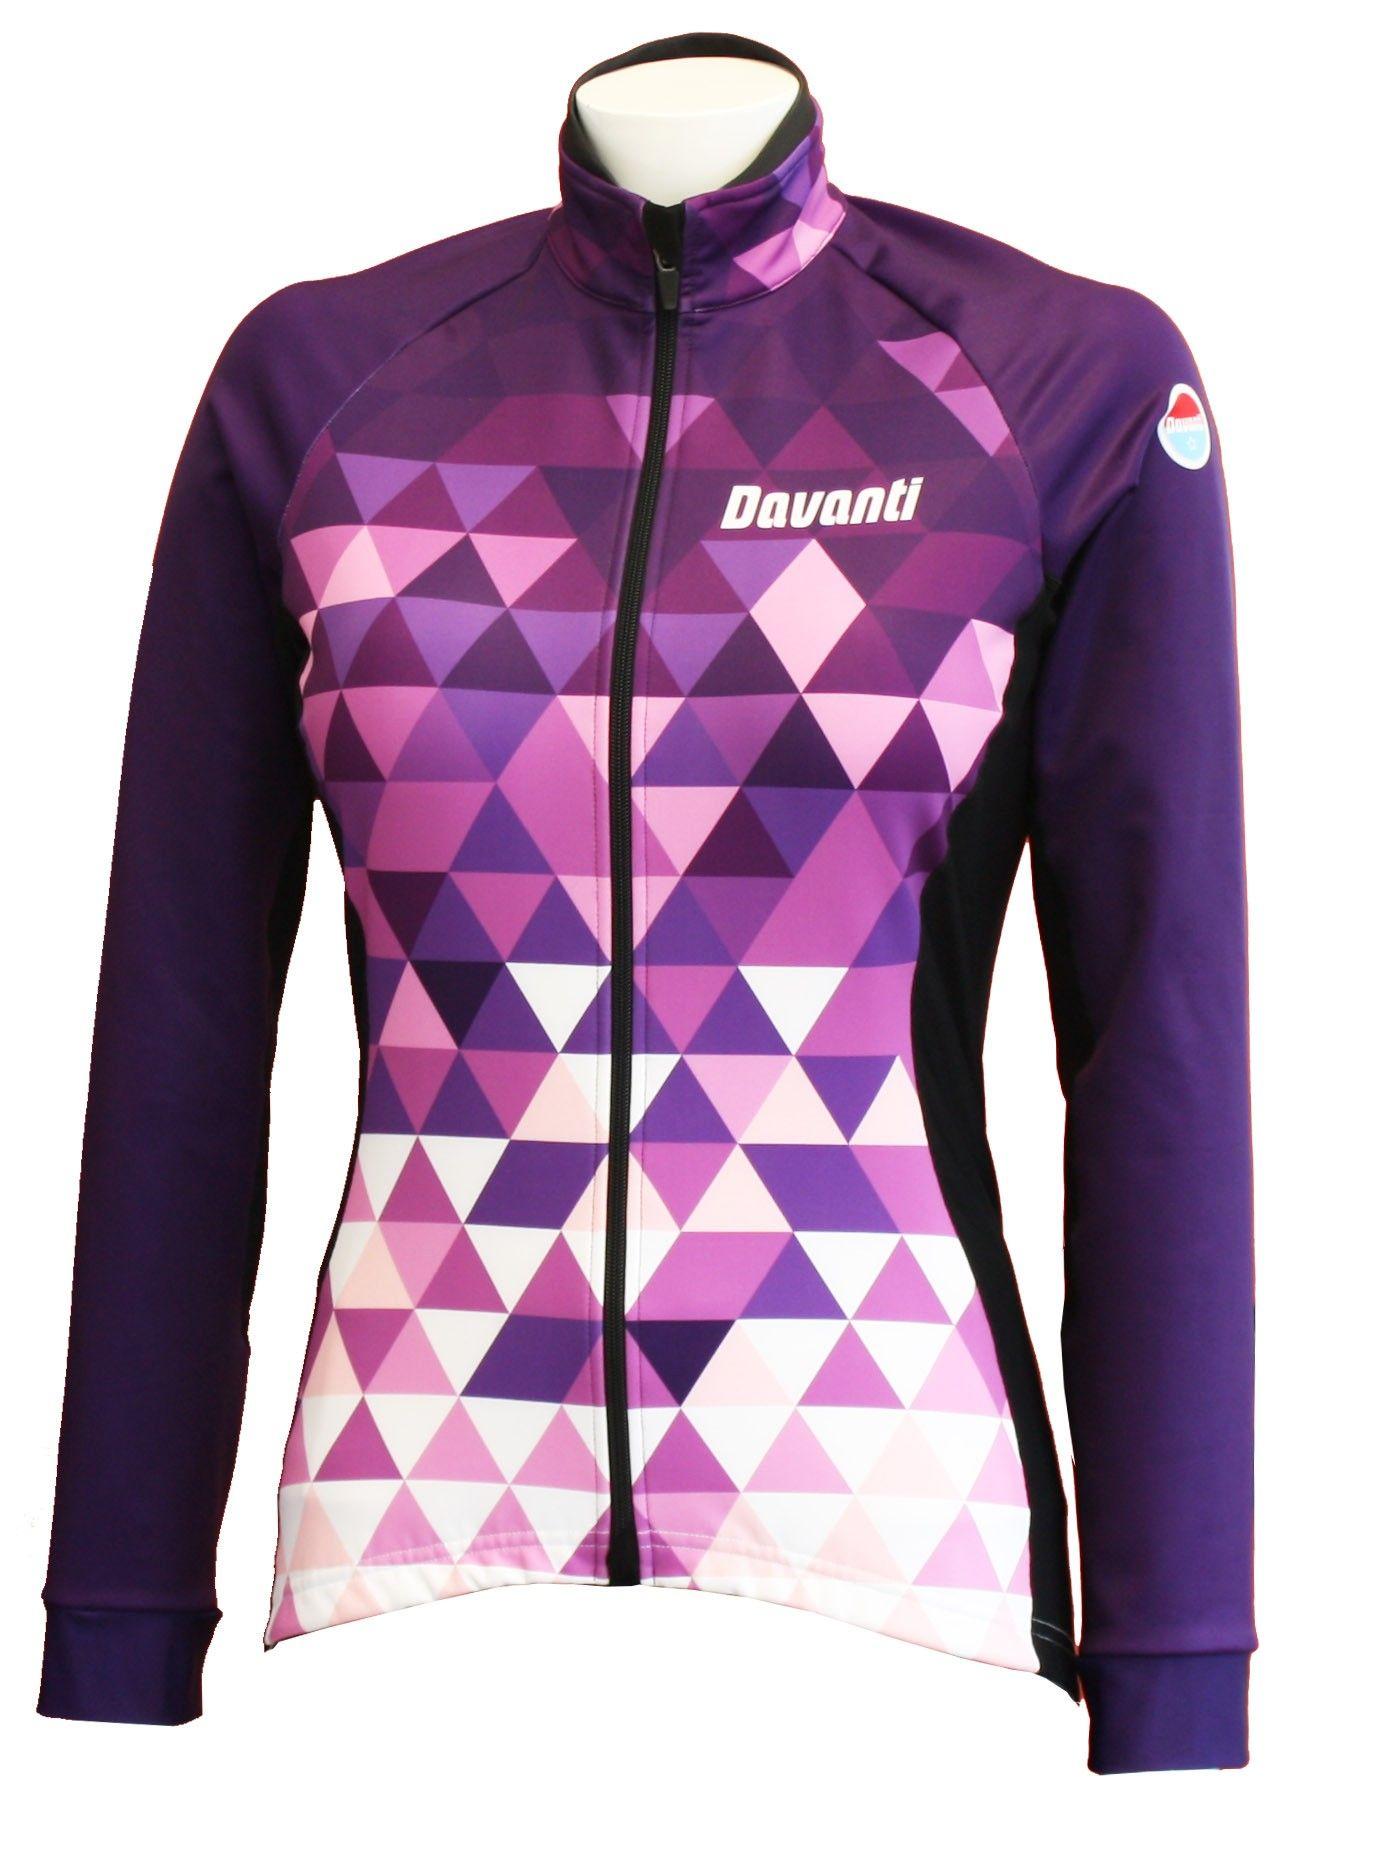 Cycling Gear · Davanti bikewear